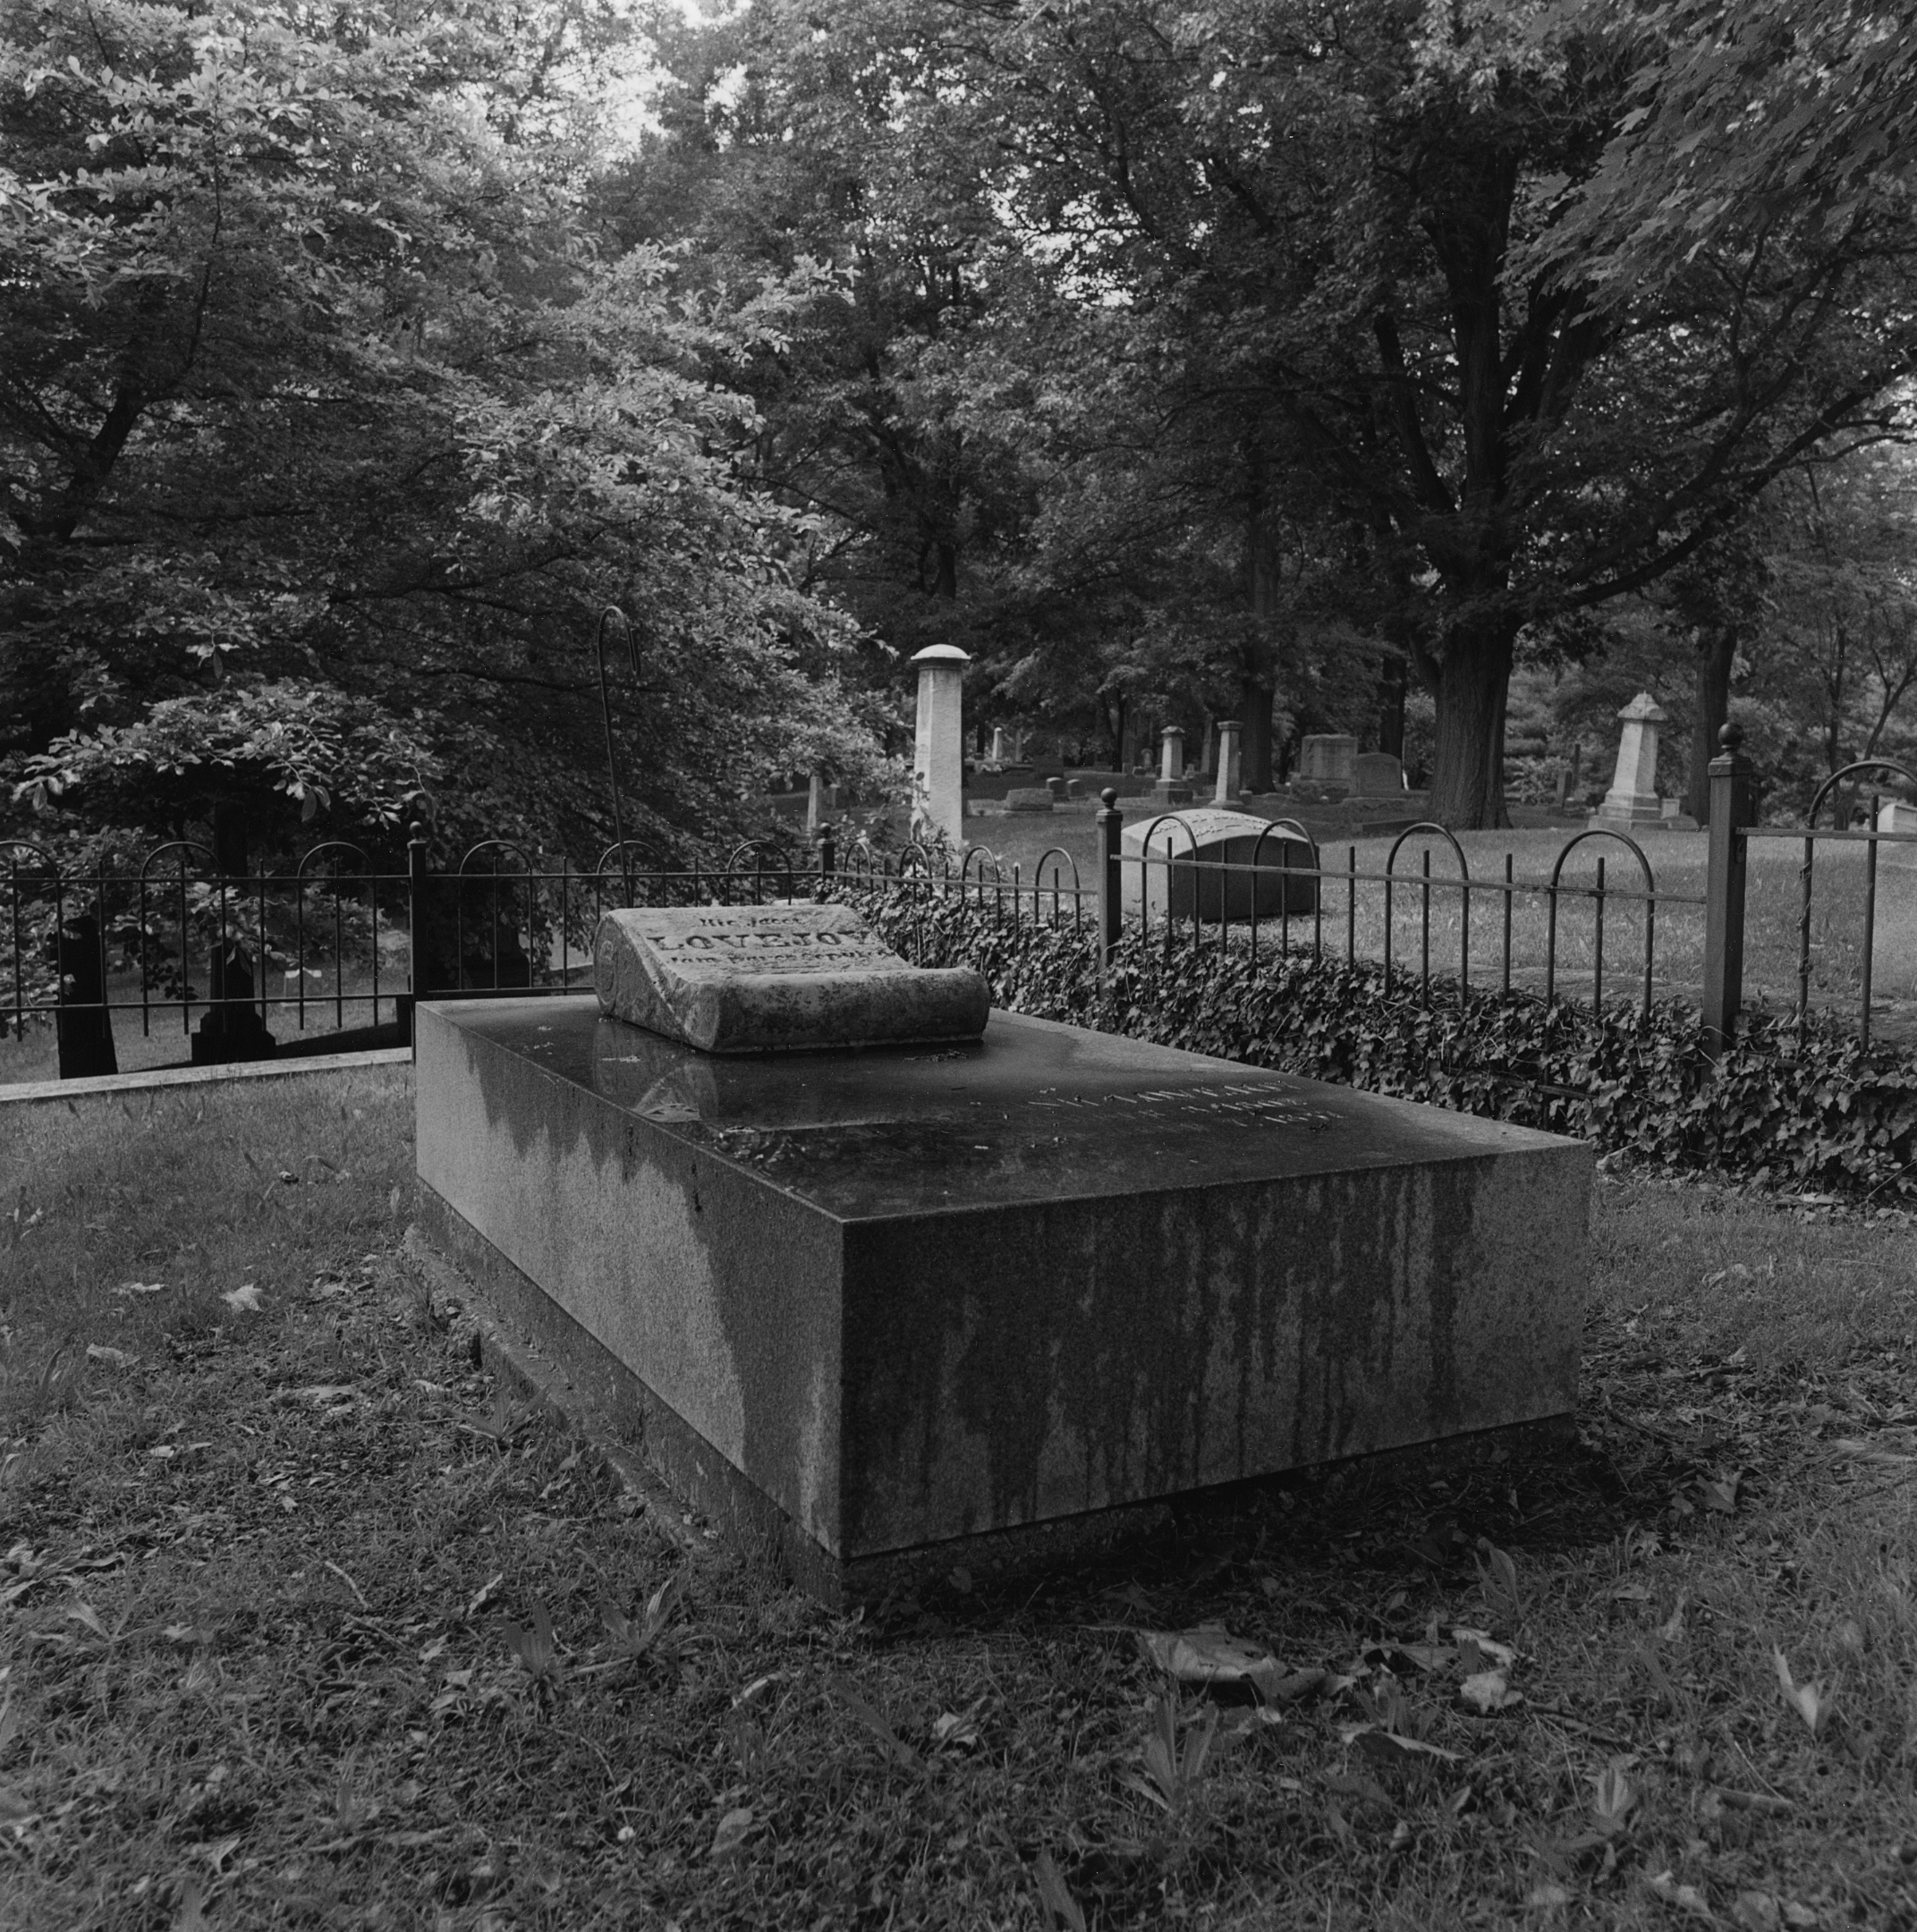 LoveJoy Grave, City Cemetery, Alton, Illinois, 2010